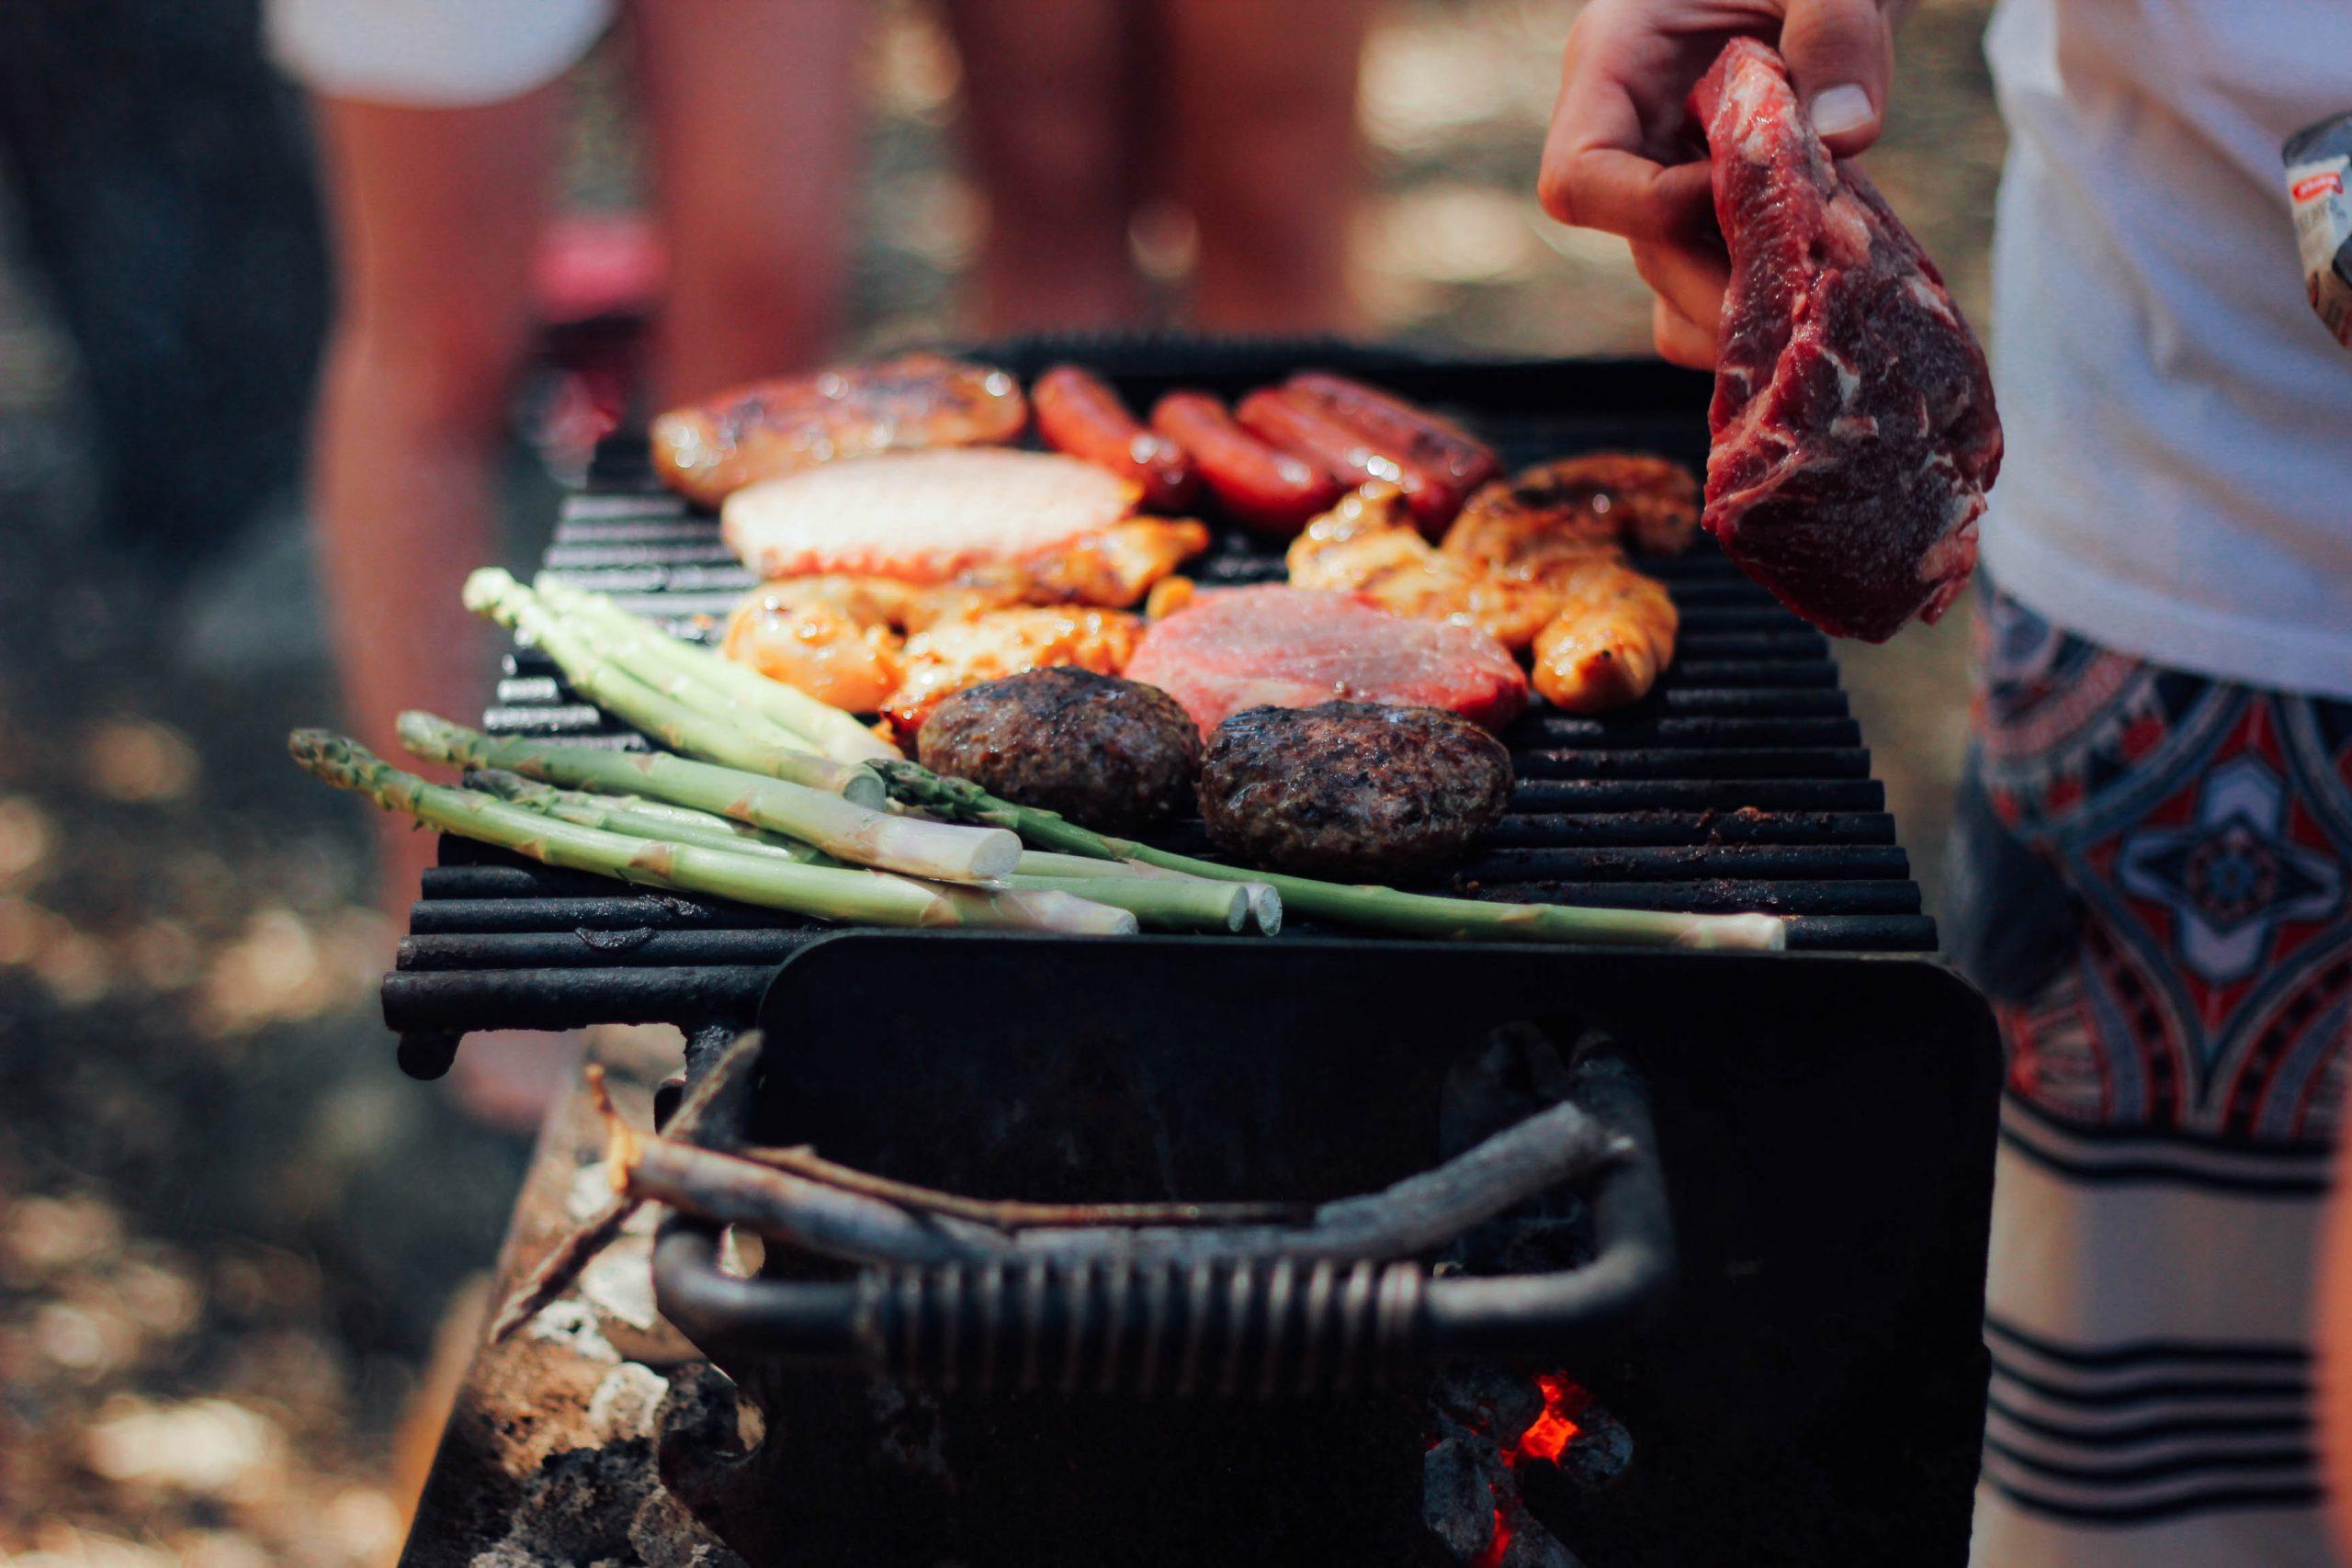 A barbecue on a beach